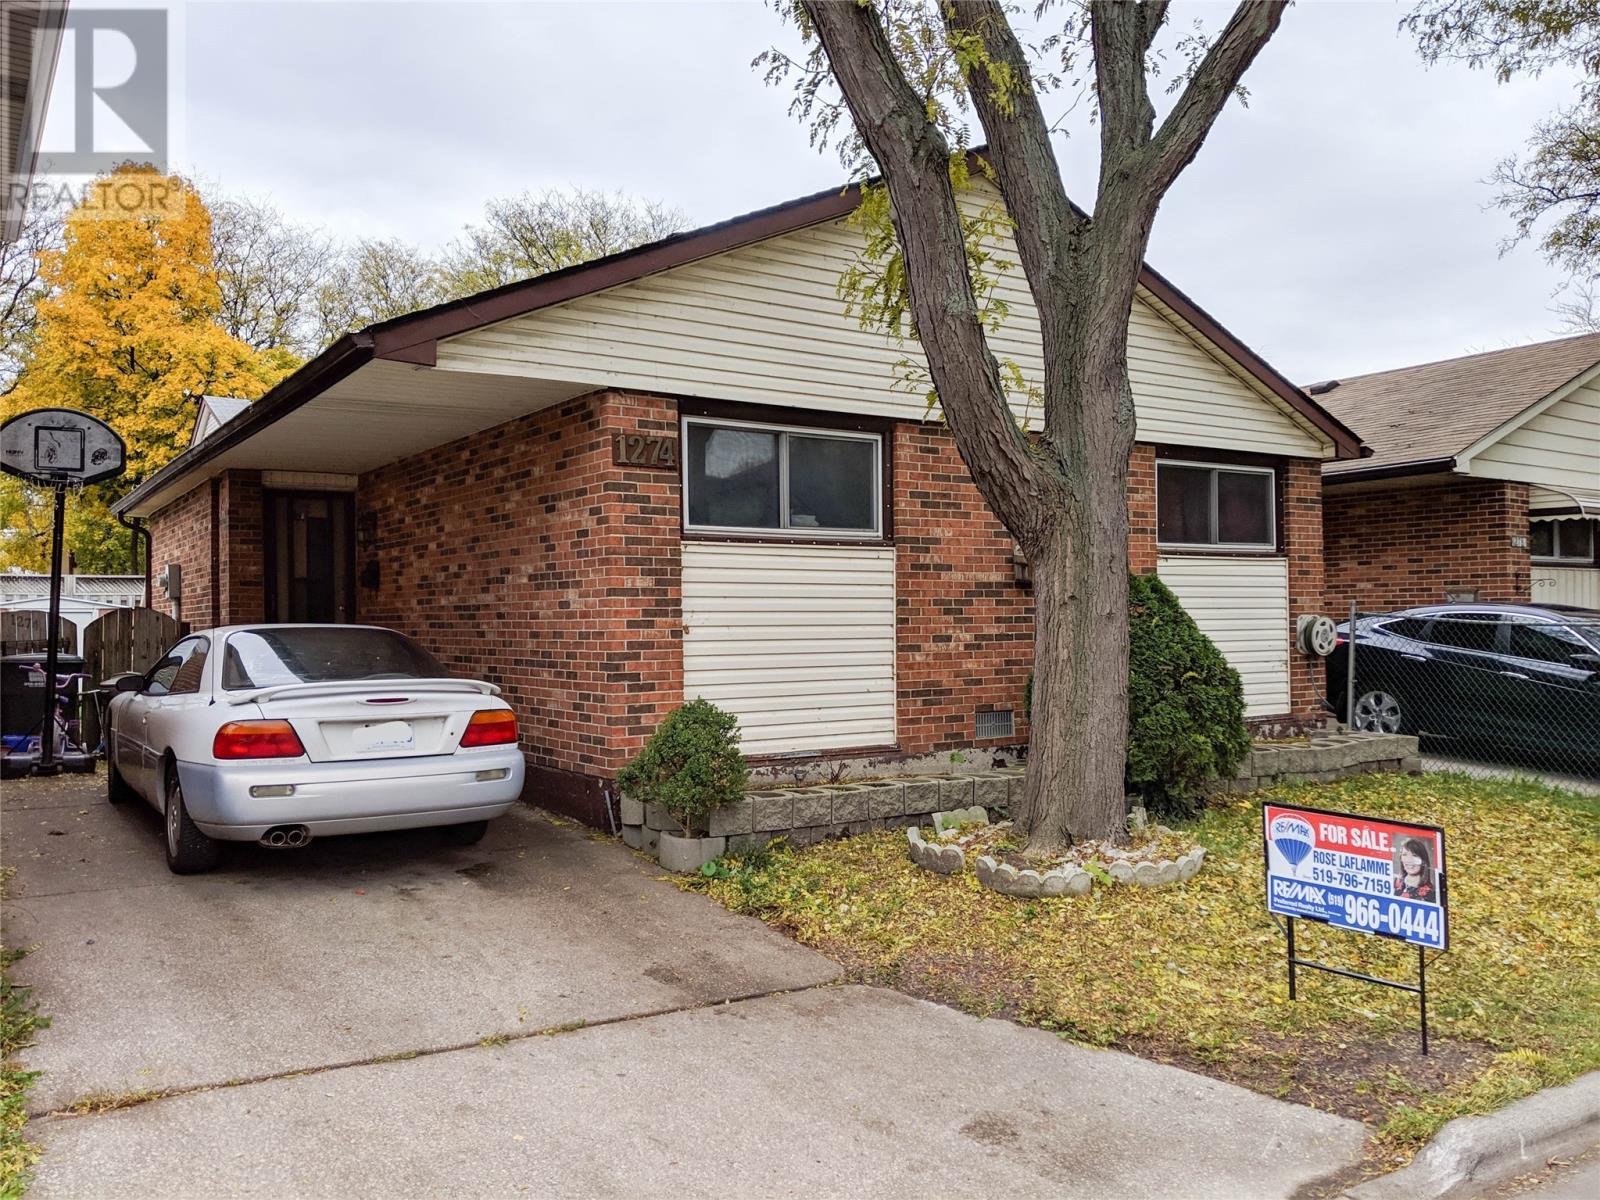 Removed: 1274 Cottage Place, Windsor, ON - Removed on 2018-11-20 04:51:03